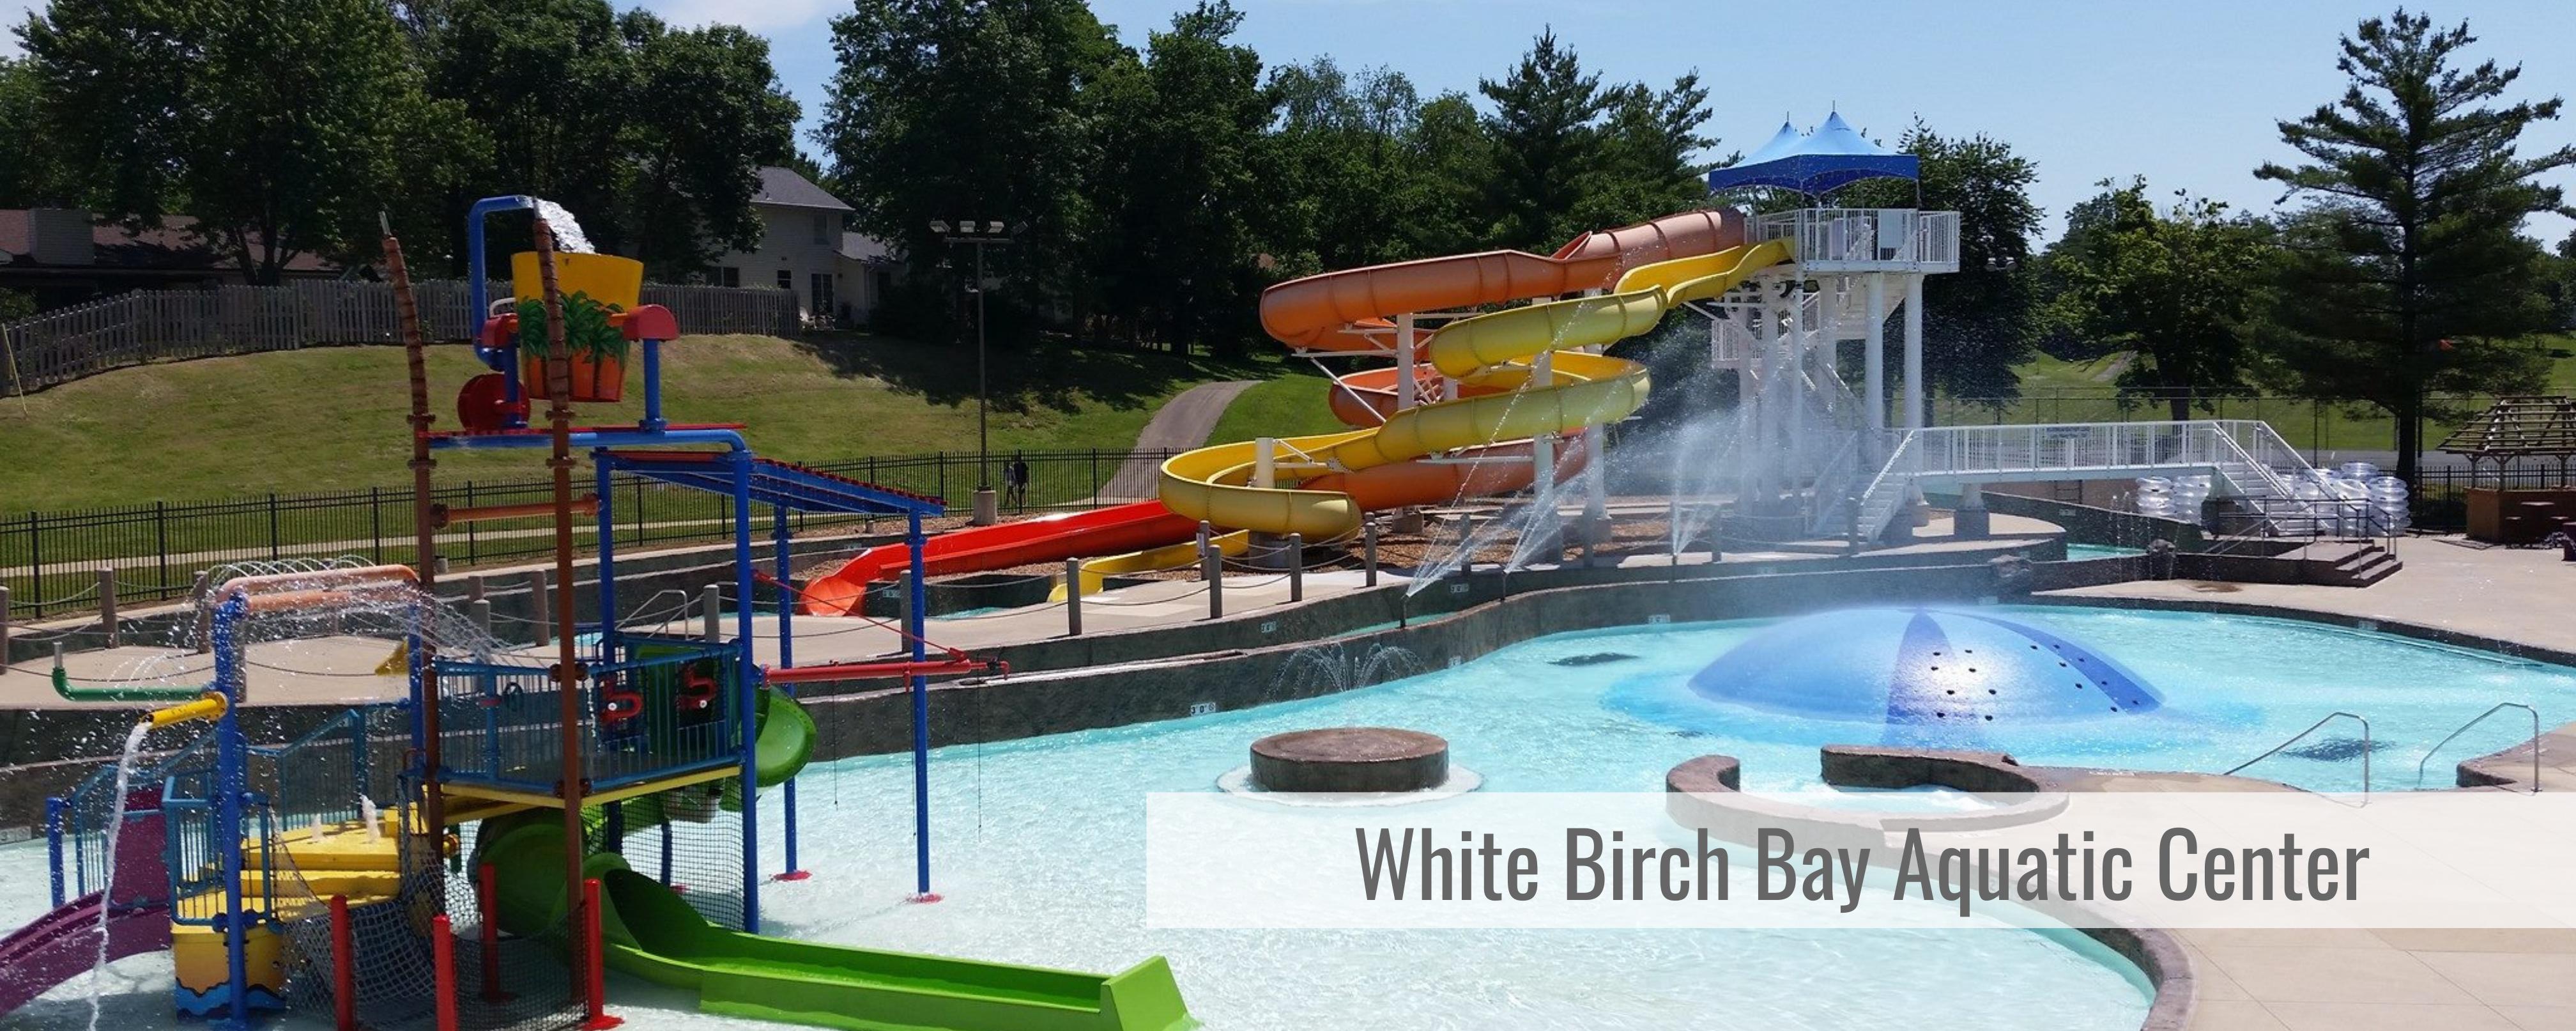 White Birch Bay Aquatic Center